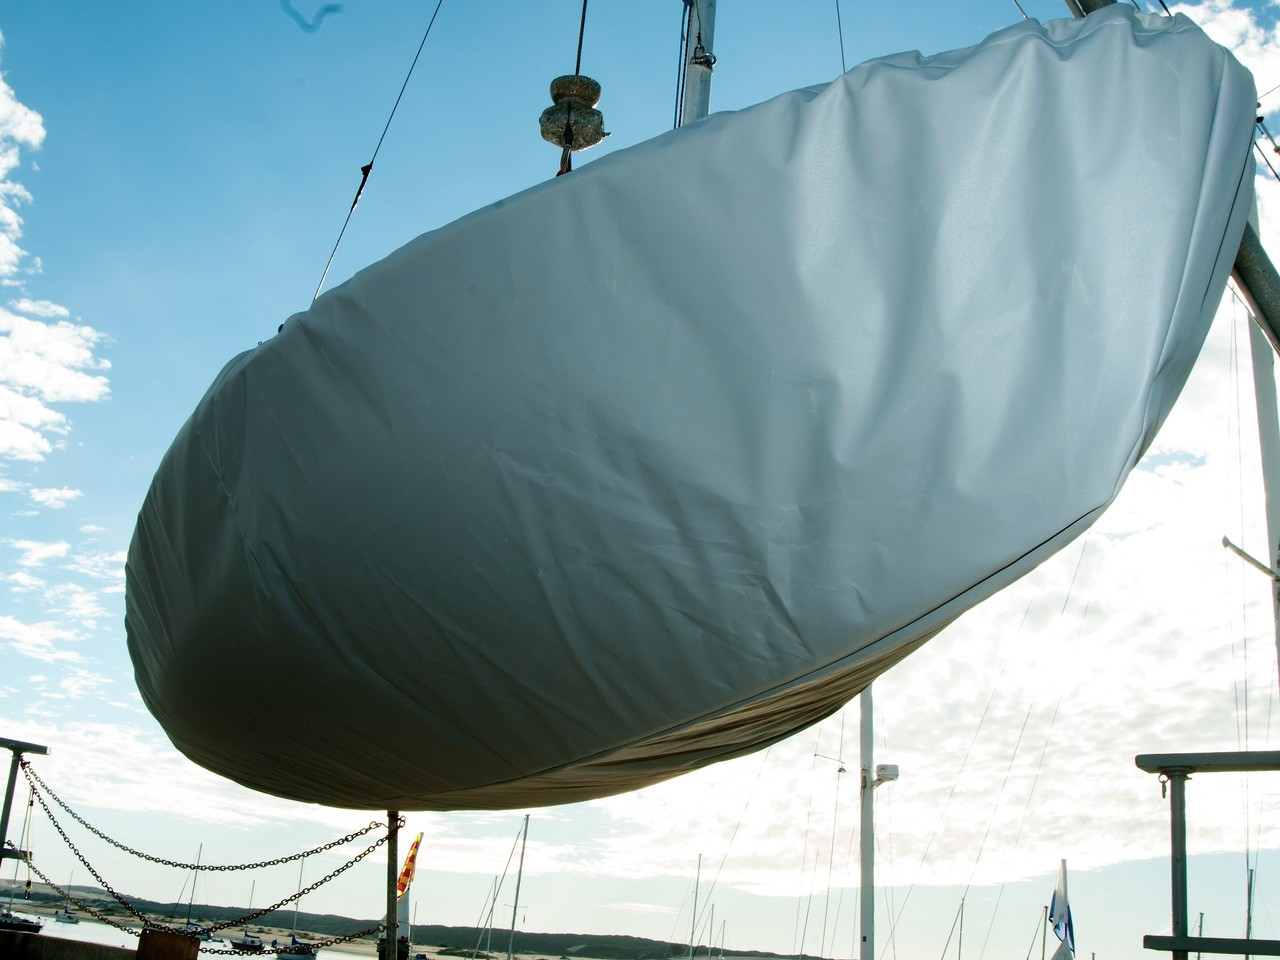 Capri Wave sailboat Hull Cover by SLO Sail and Canvas